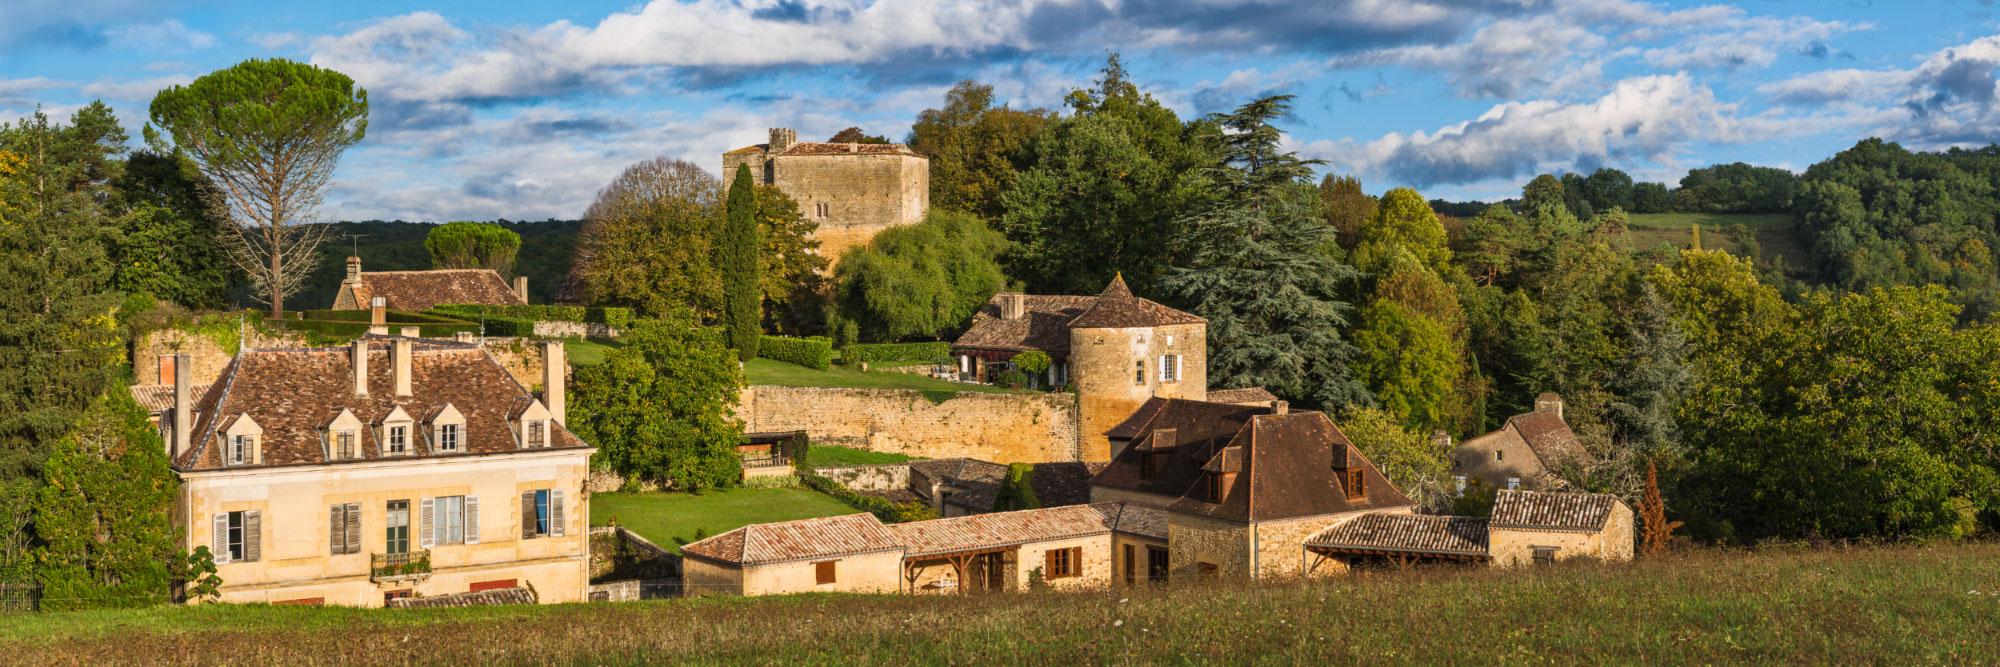 Village médiéval de Montferrand-du-Périgord